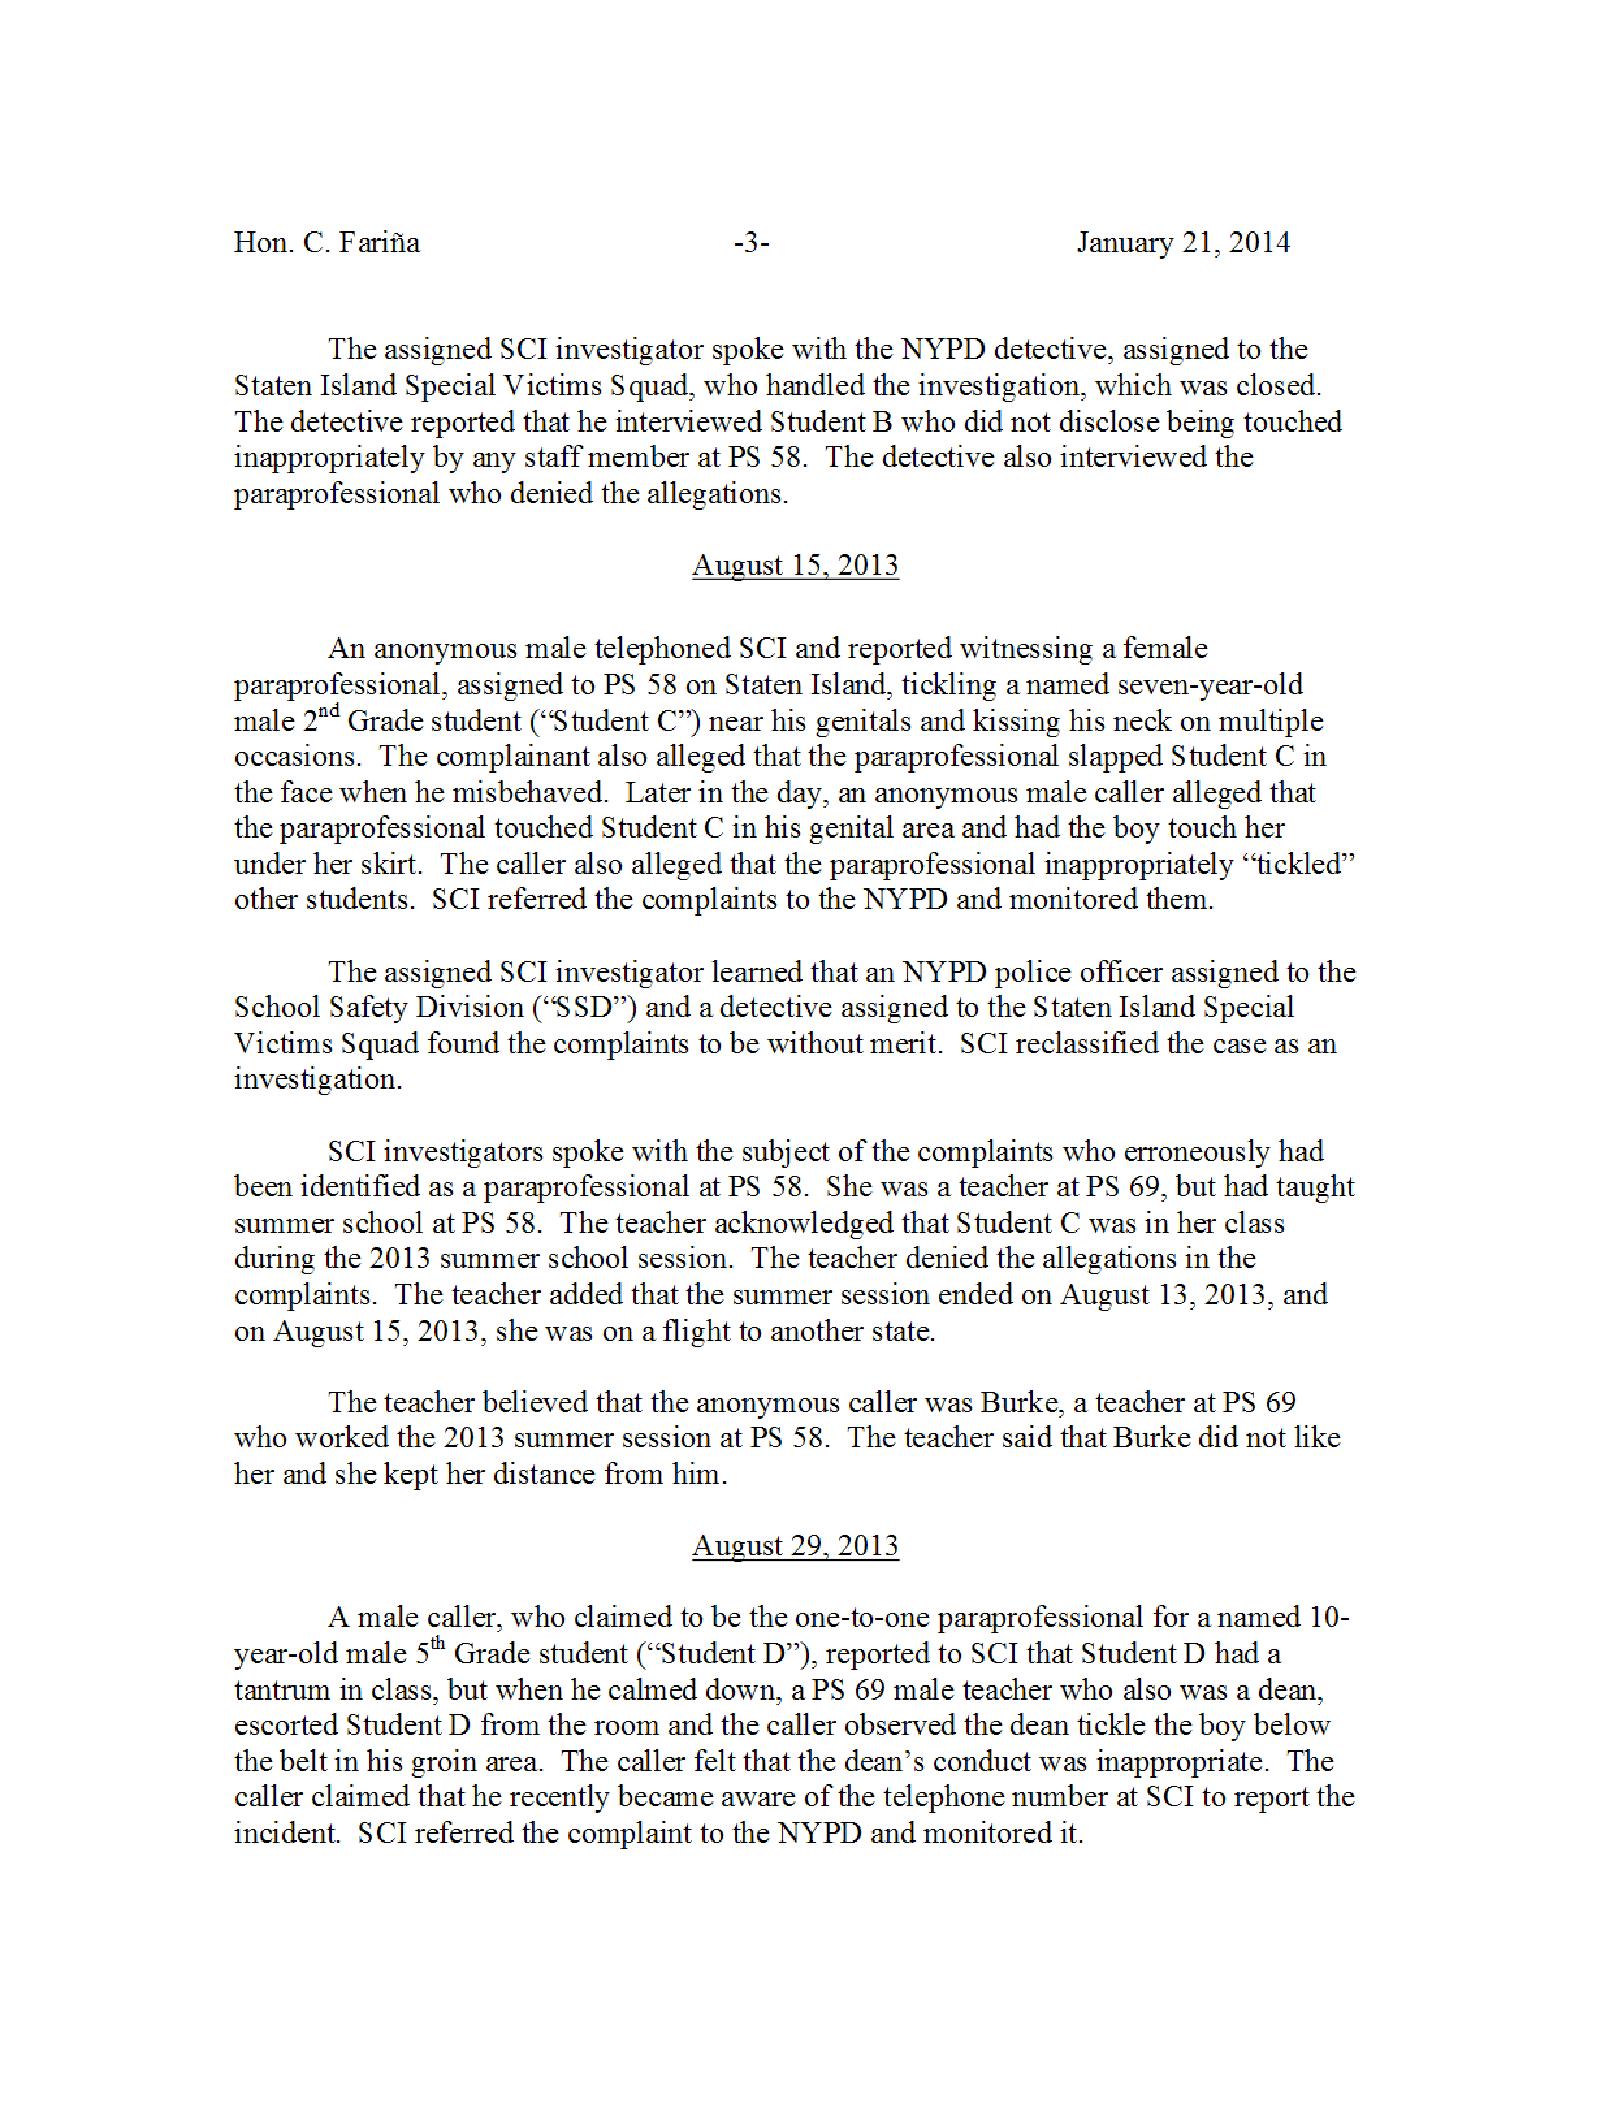 Copy of 1-22-2014 9-25-02 AM03.png